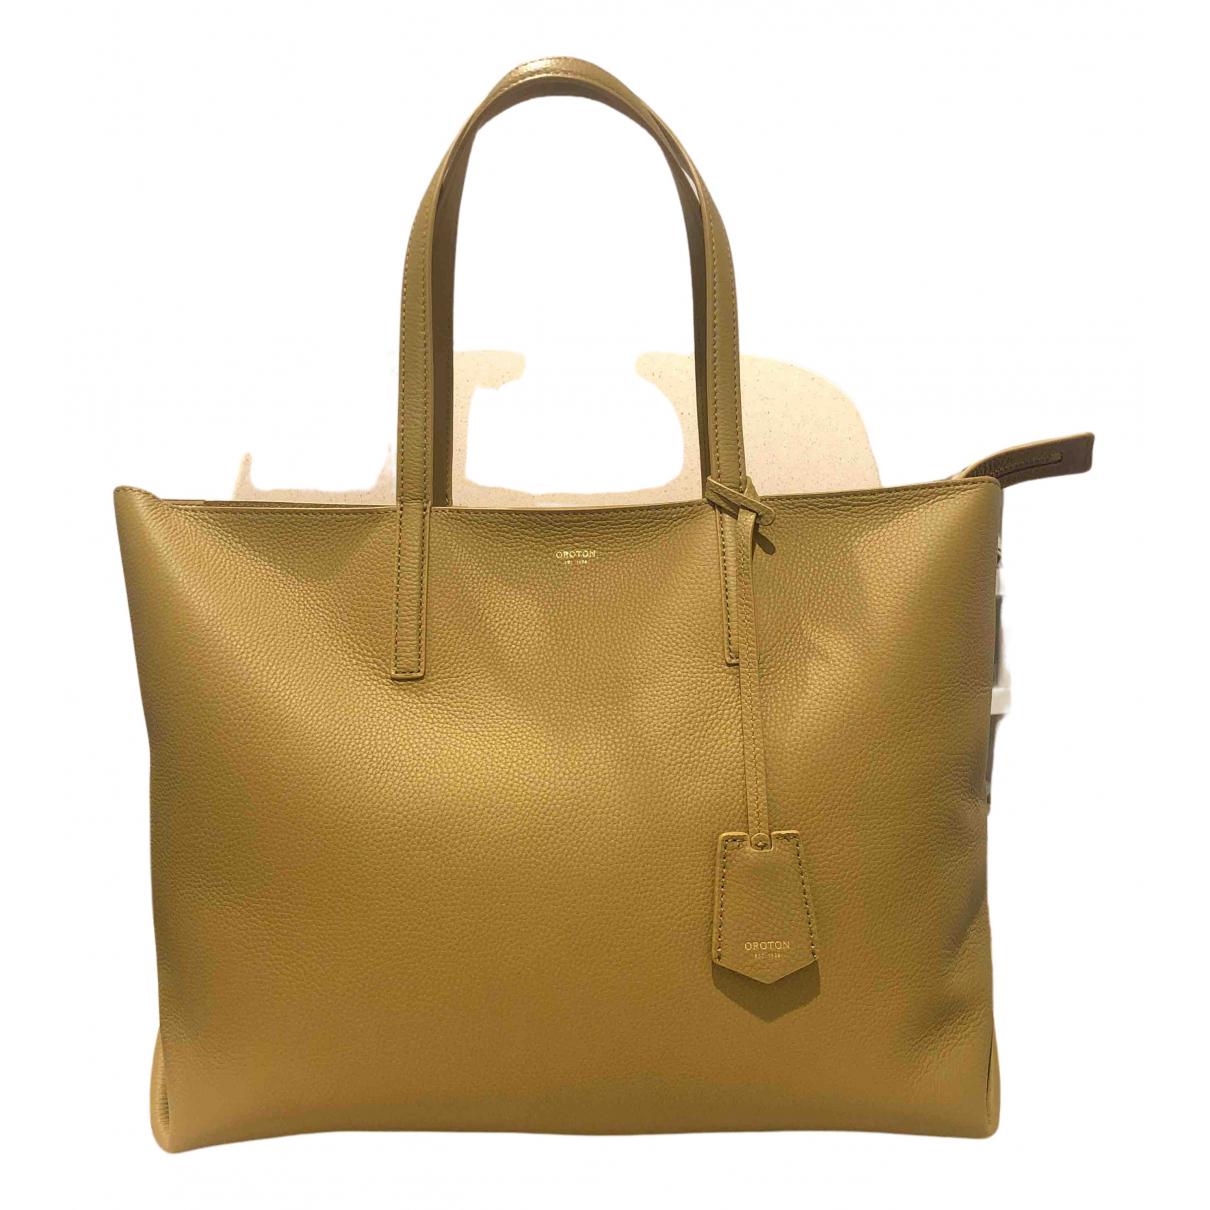 Oroton \N Handtasche in  Khaki Leder